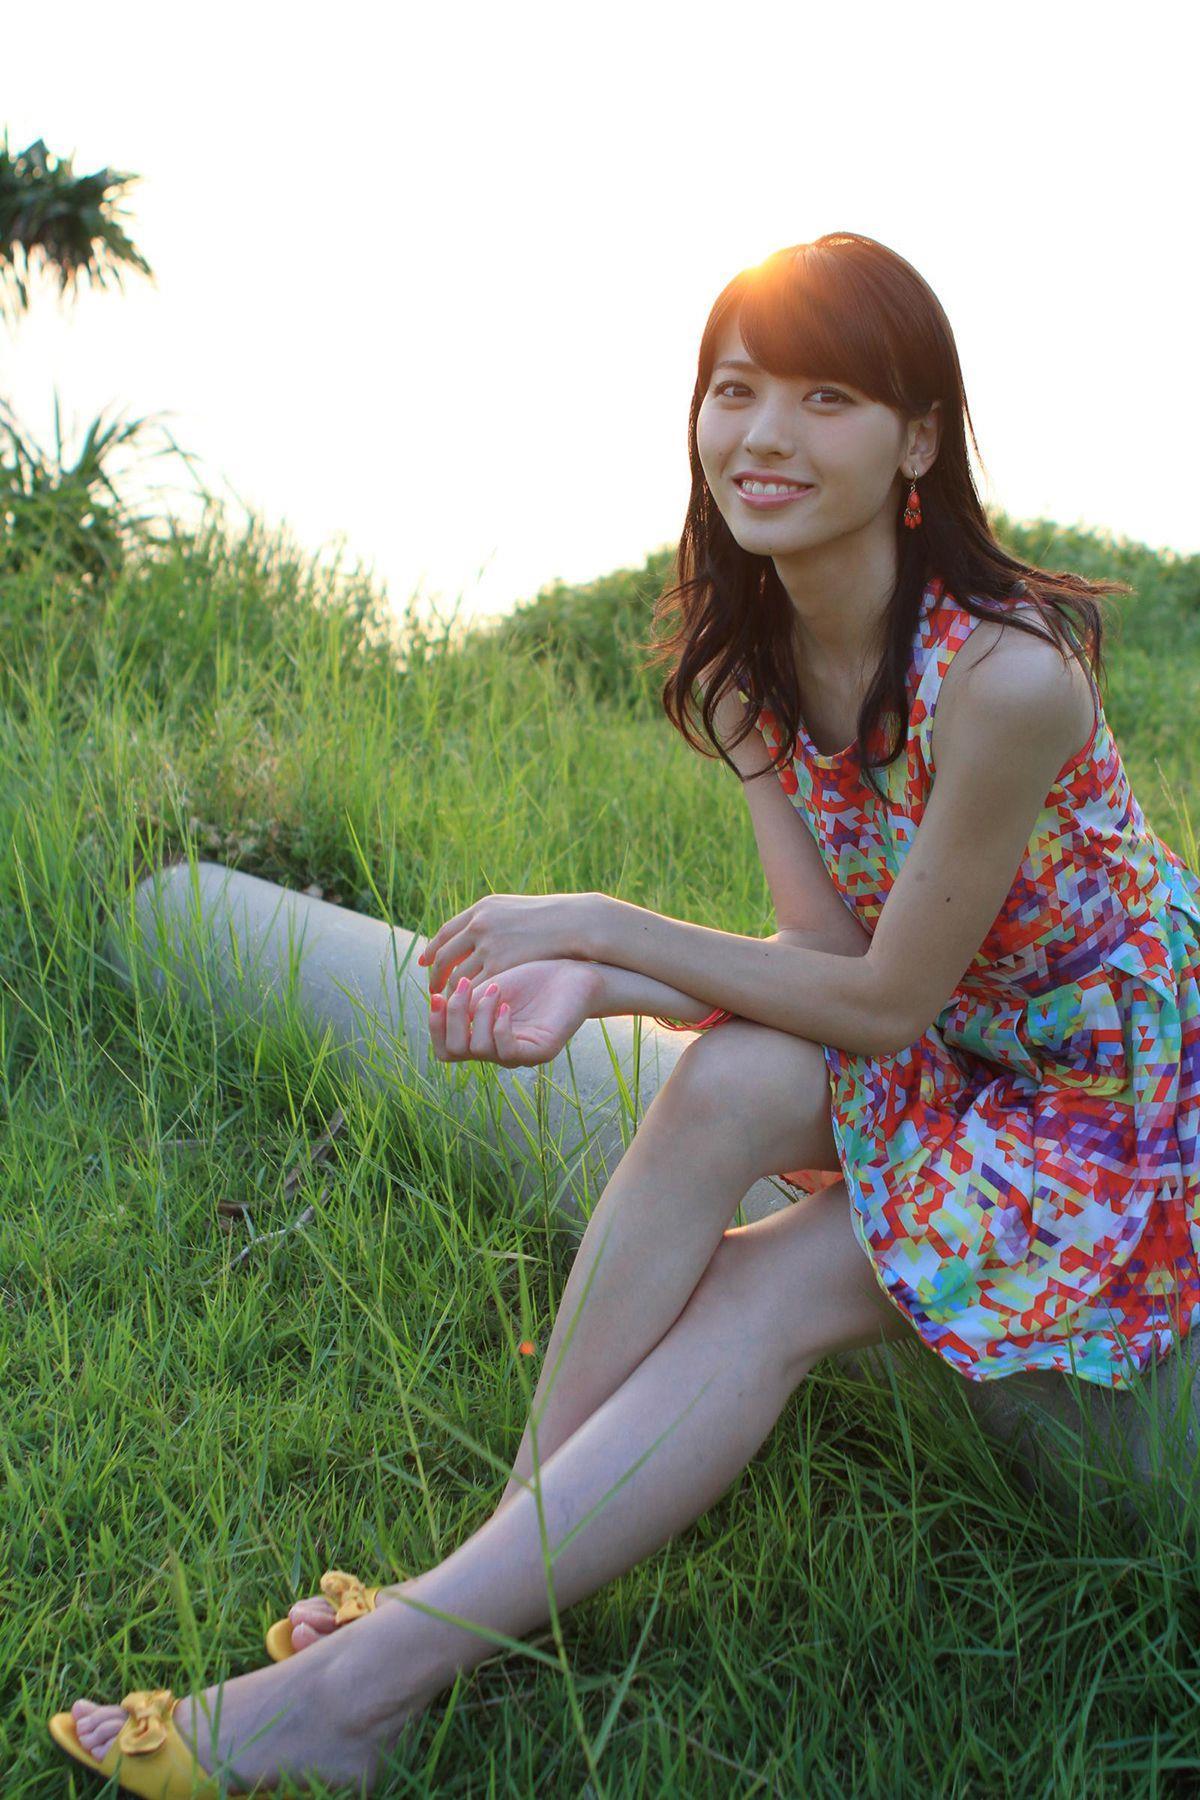 矢島舞美 エロ画像 64